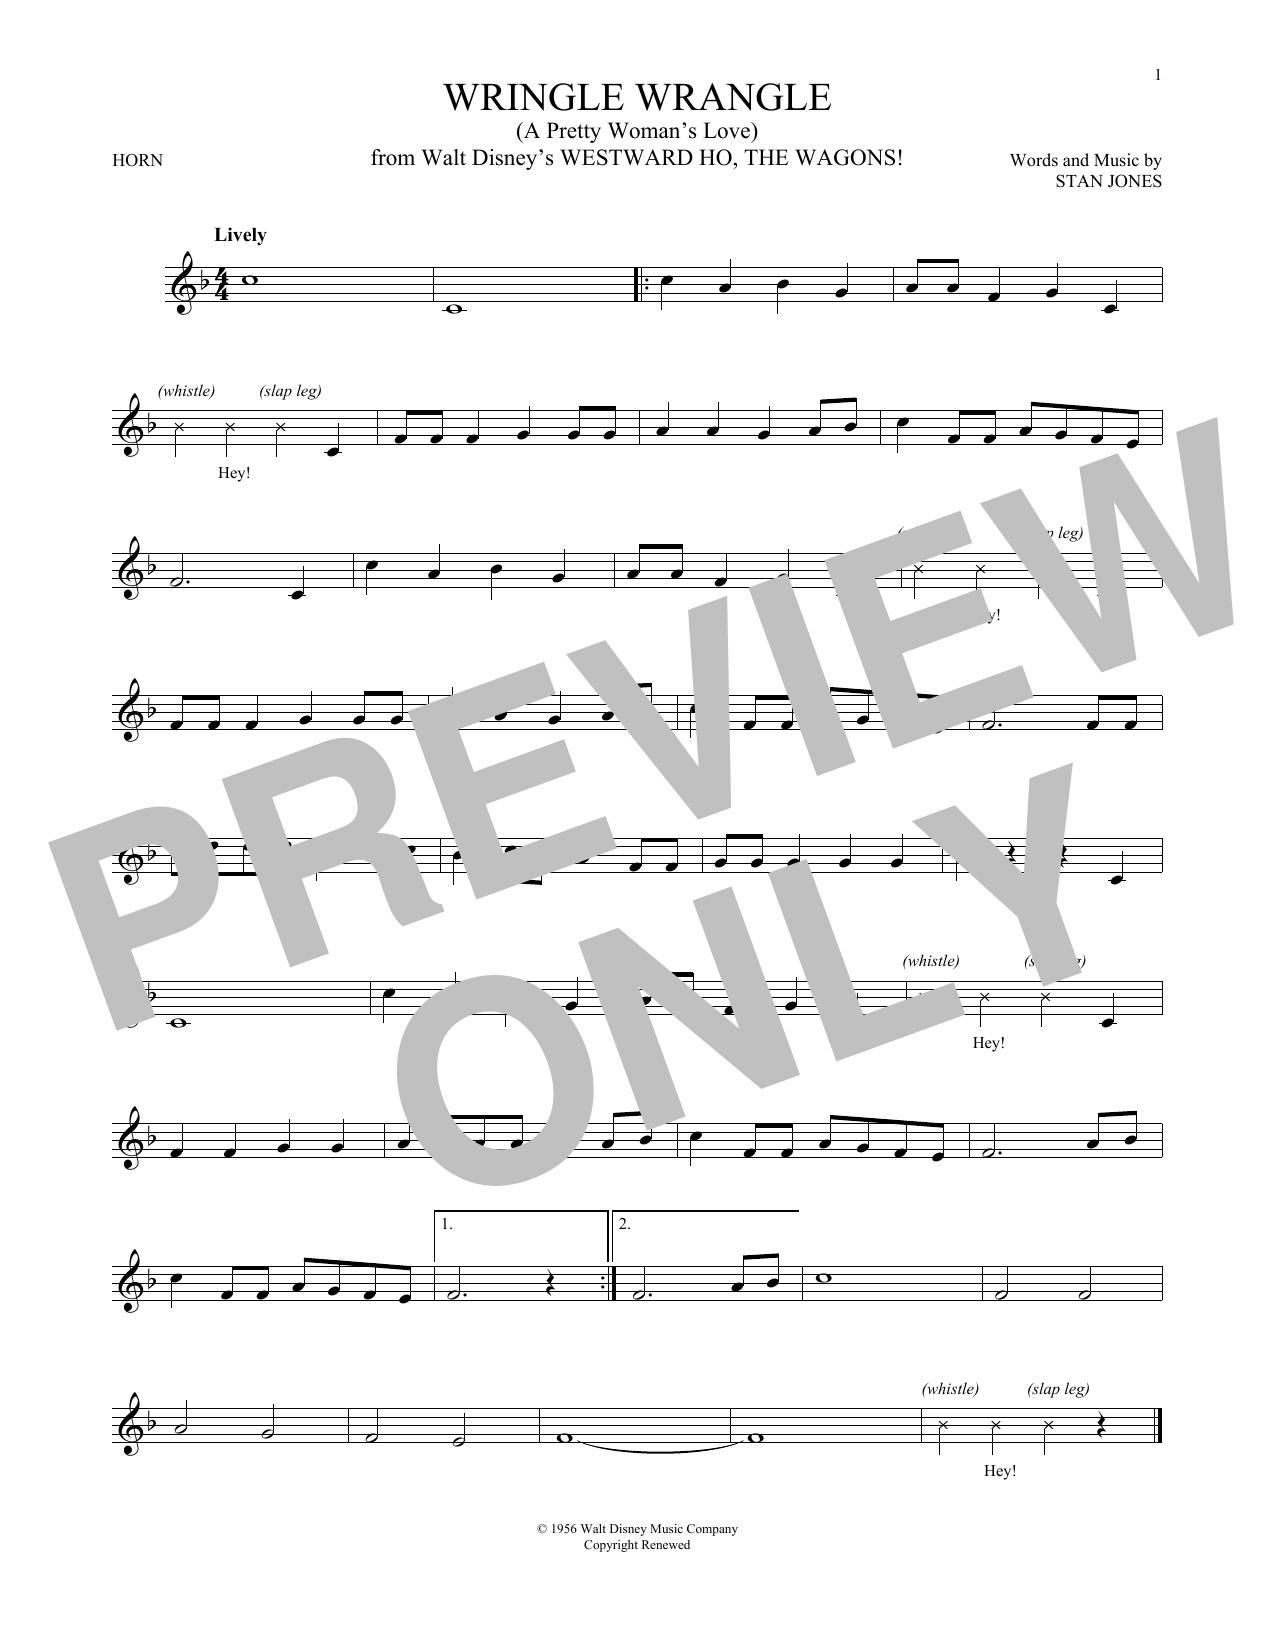 Wringle Wrangle (A Pretty Woman's Love) (French Horn Solo)